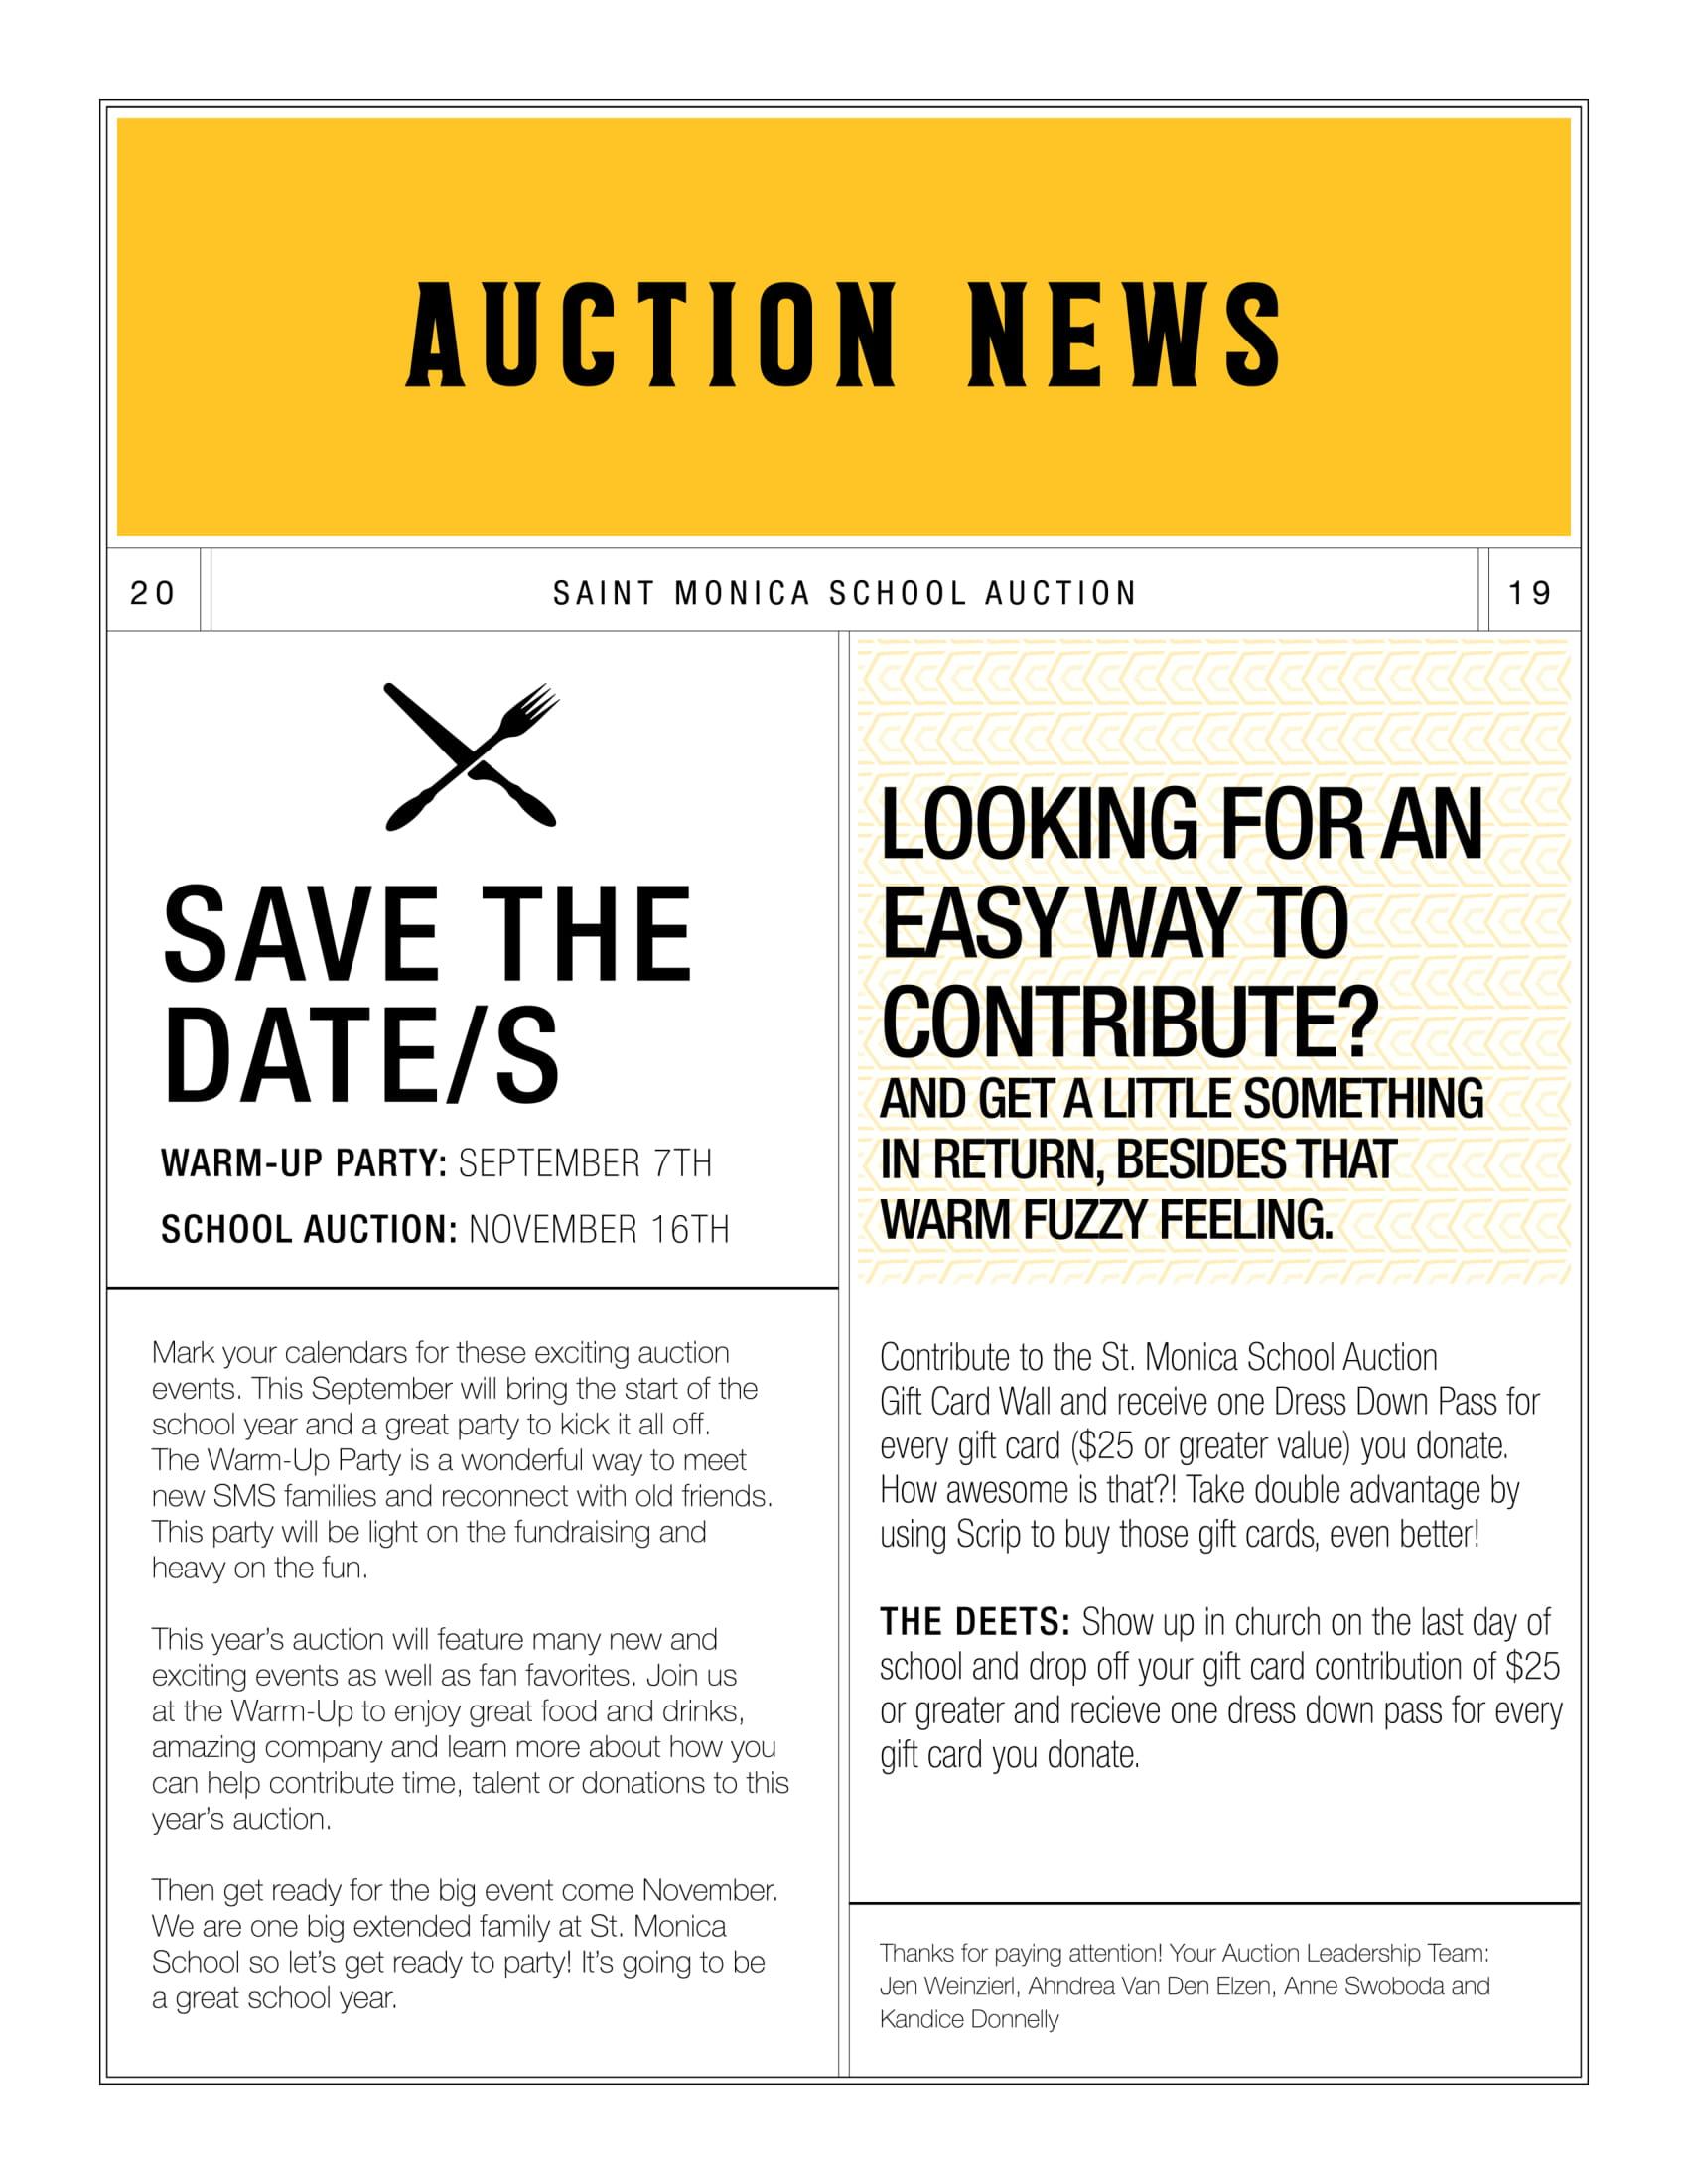 AuctionNews_01-1.jpg